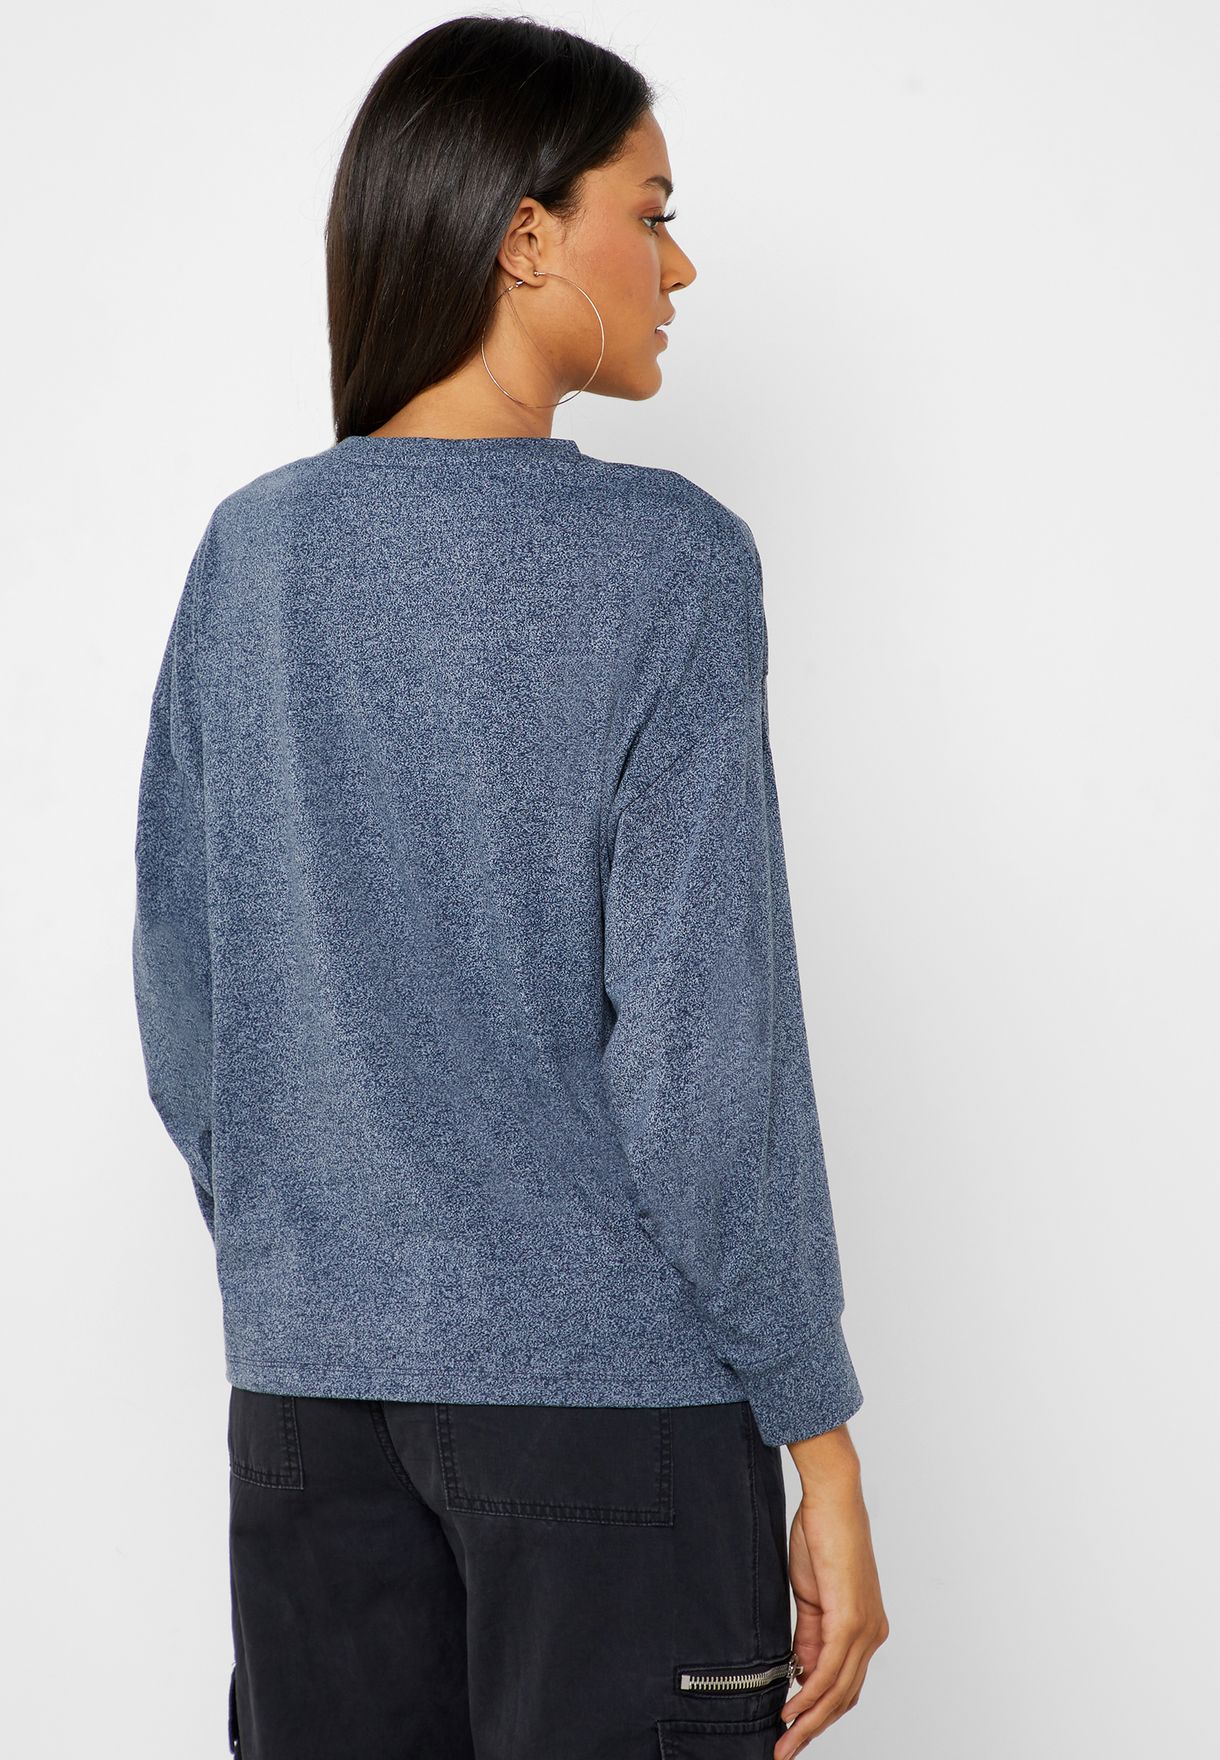 Embroidery Detail Textured Sweatshirt